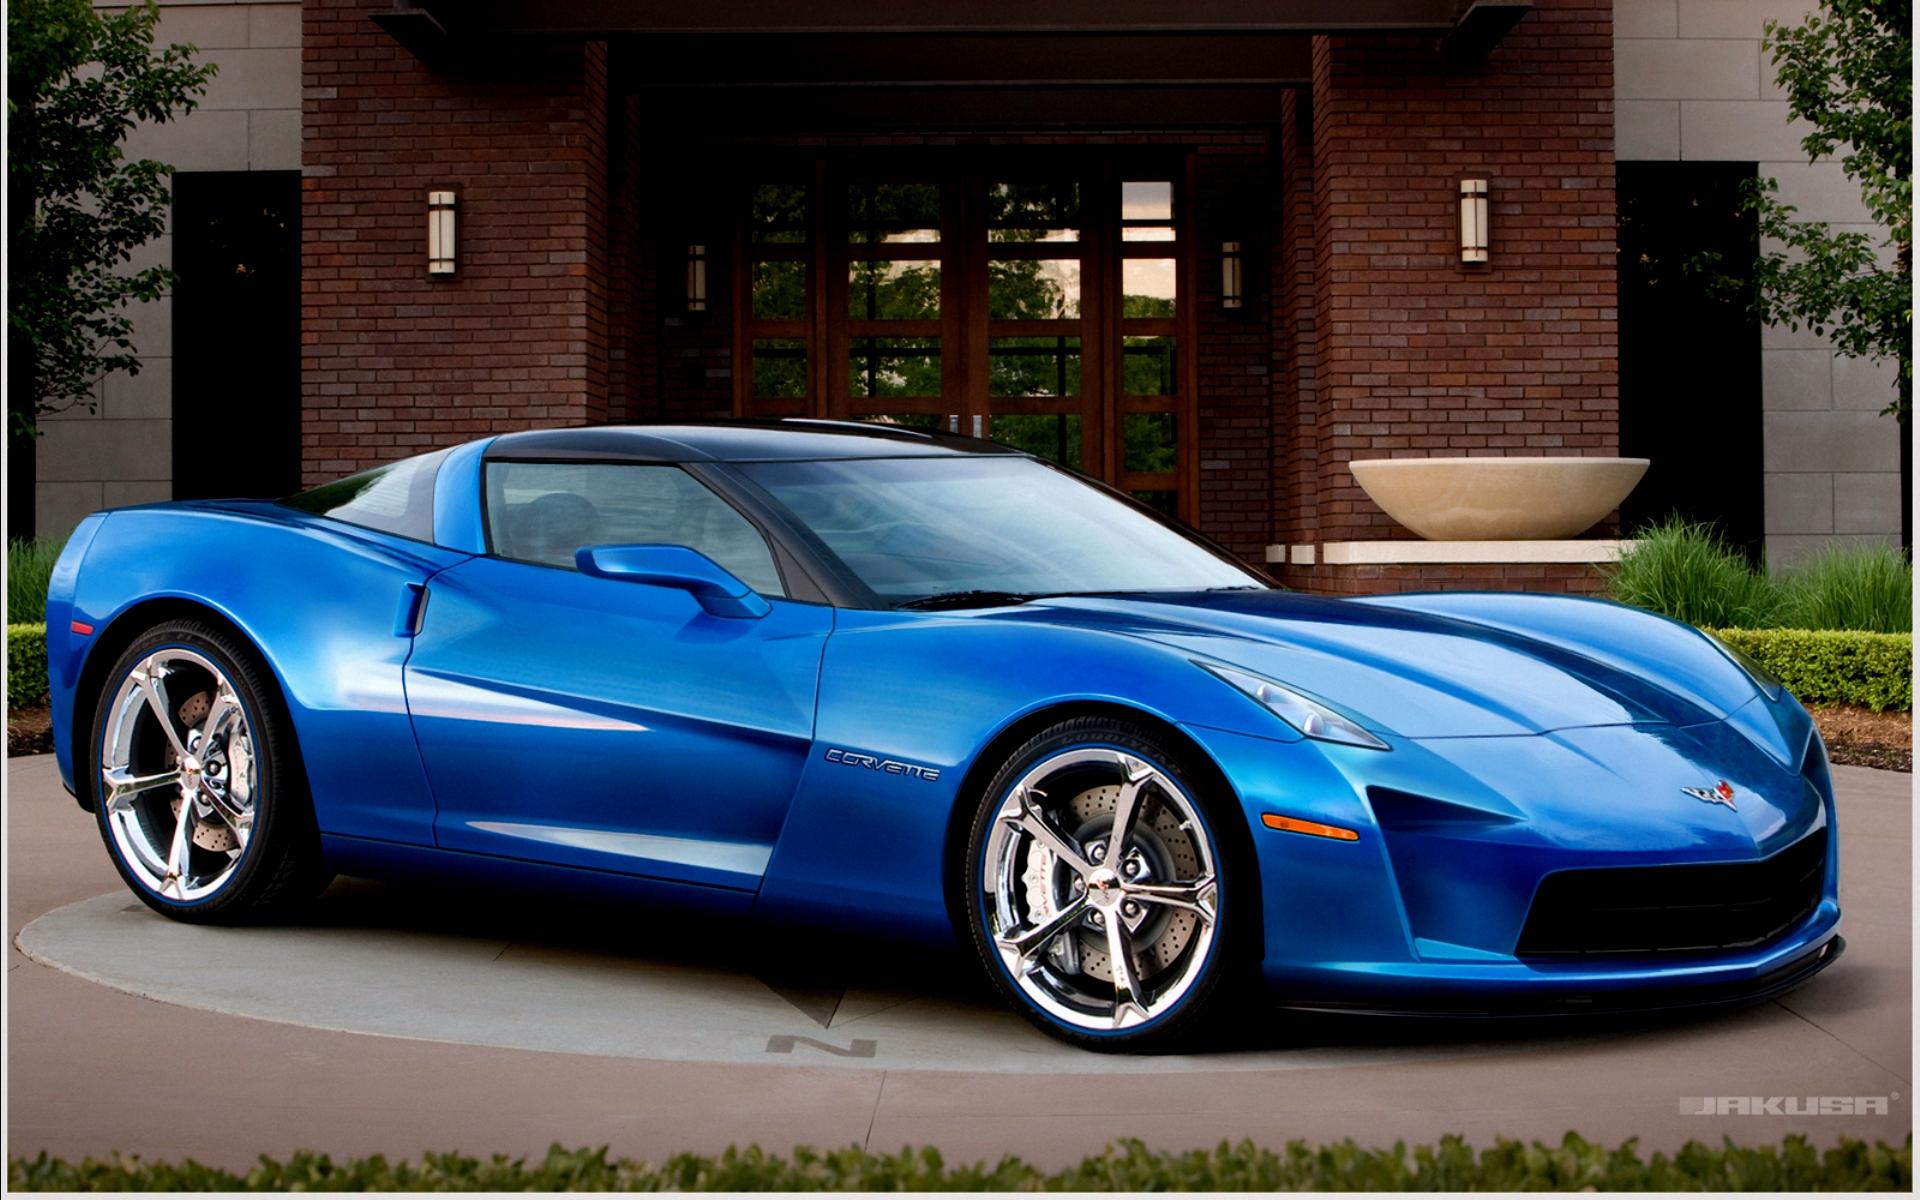 41 2016 Corvette Stingray Hd Wallpaper On Wallpapersafari